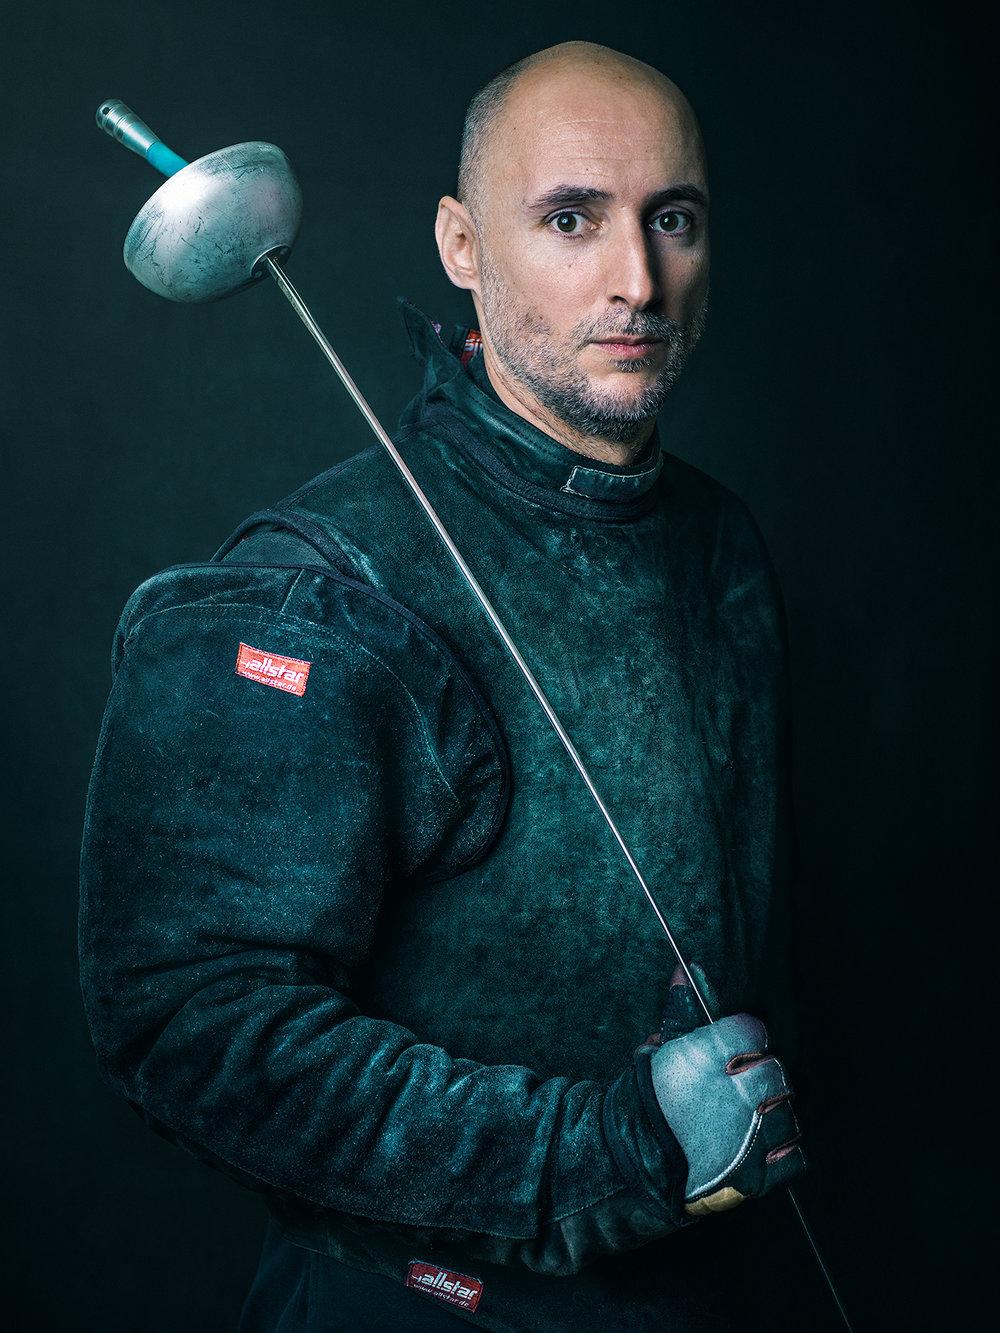 Oscar-arribas-esgrima-maestro-fencing-master-fencer-fechten-scherma-escrime-portrait-fotografo-retrato-photographer018.jpg